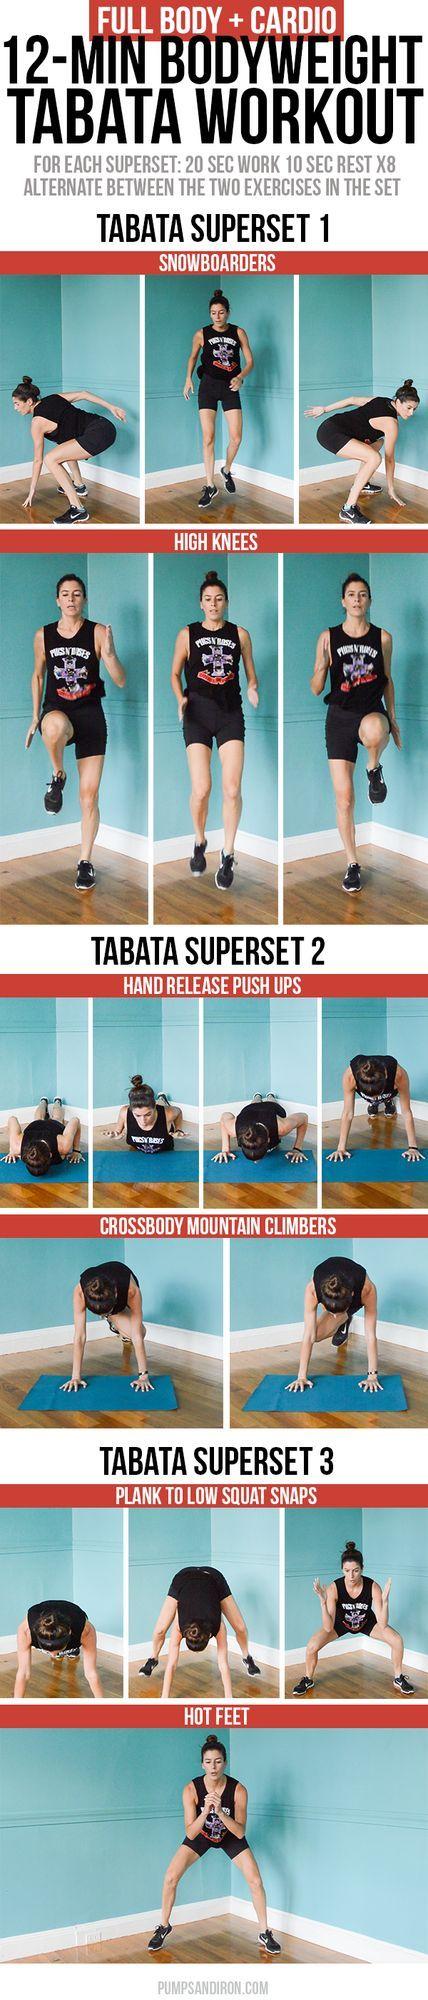 12-Minute Bodyweight Tabata Workout Series: Full Body + Cardio   Pumps & Iron   Bloglovin'